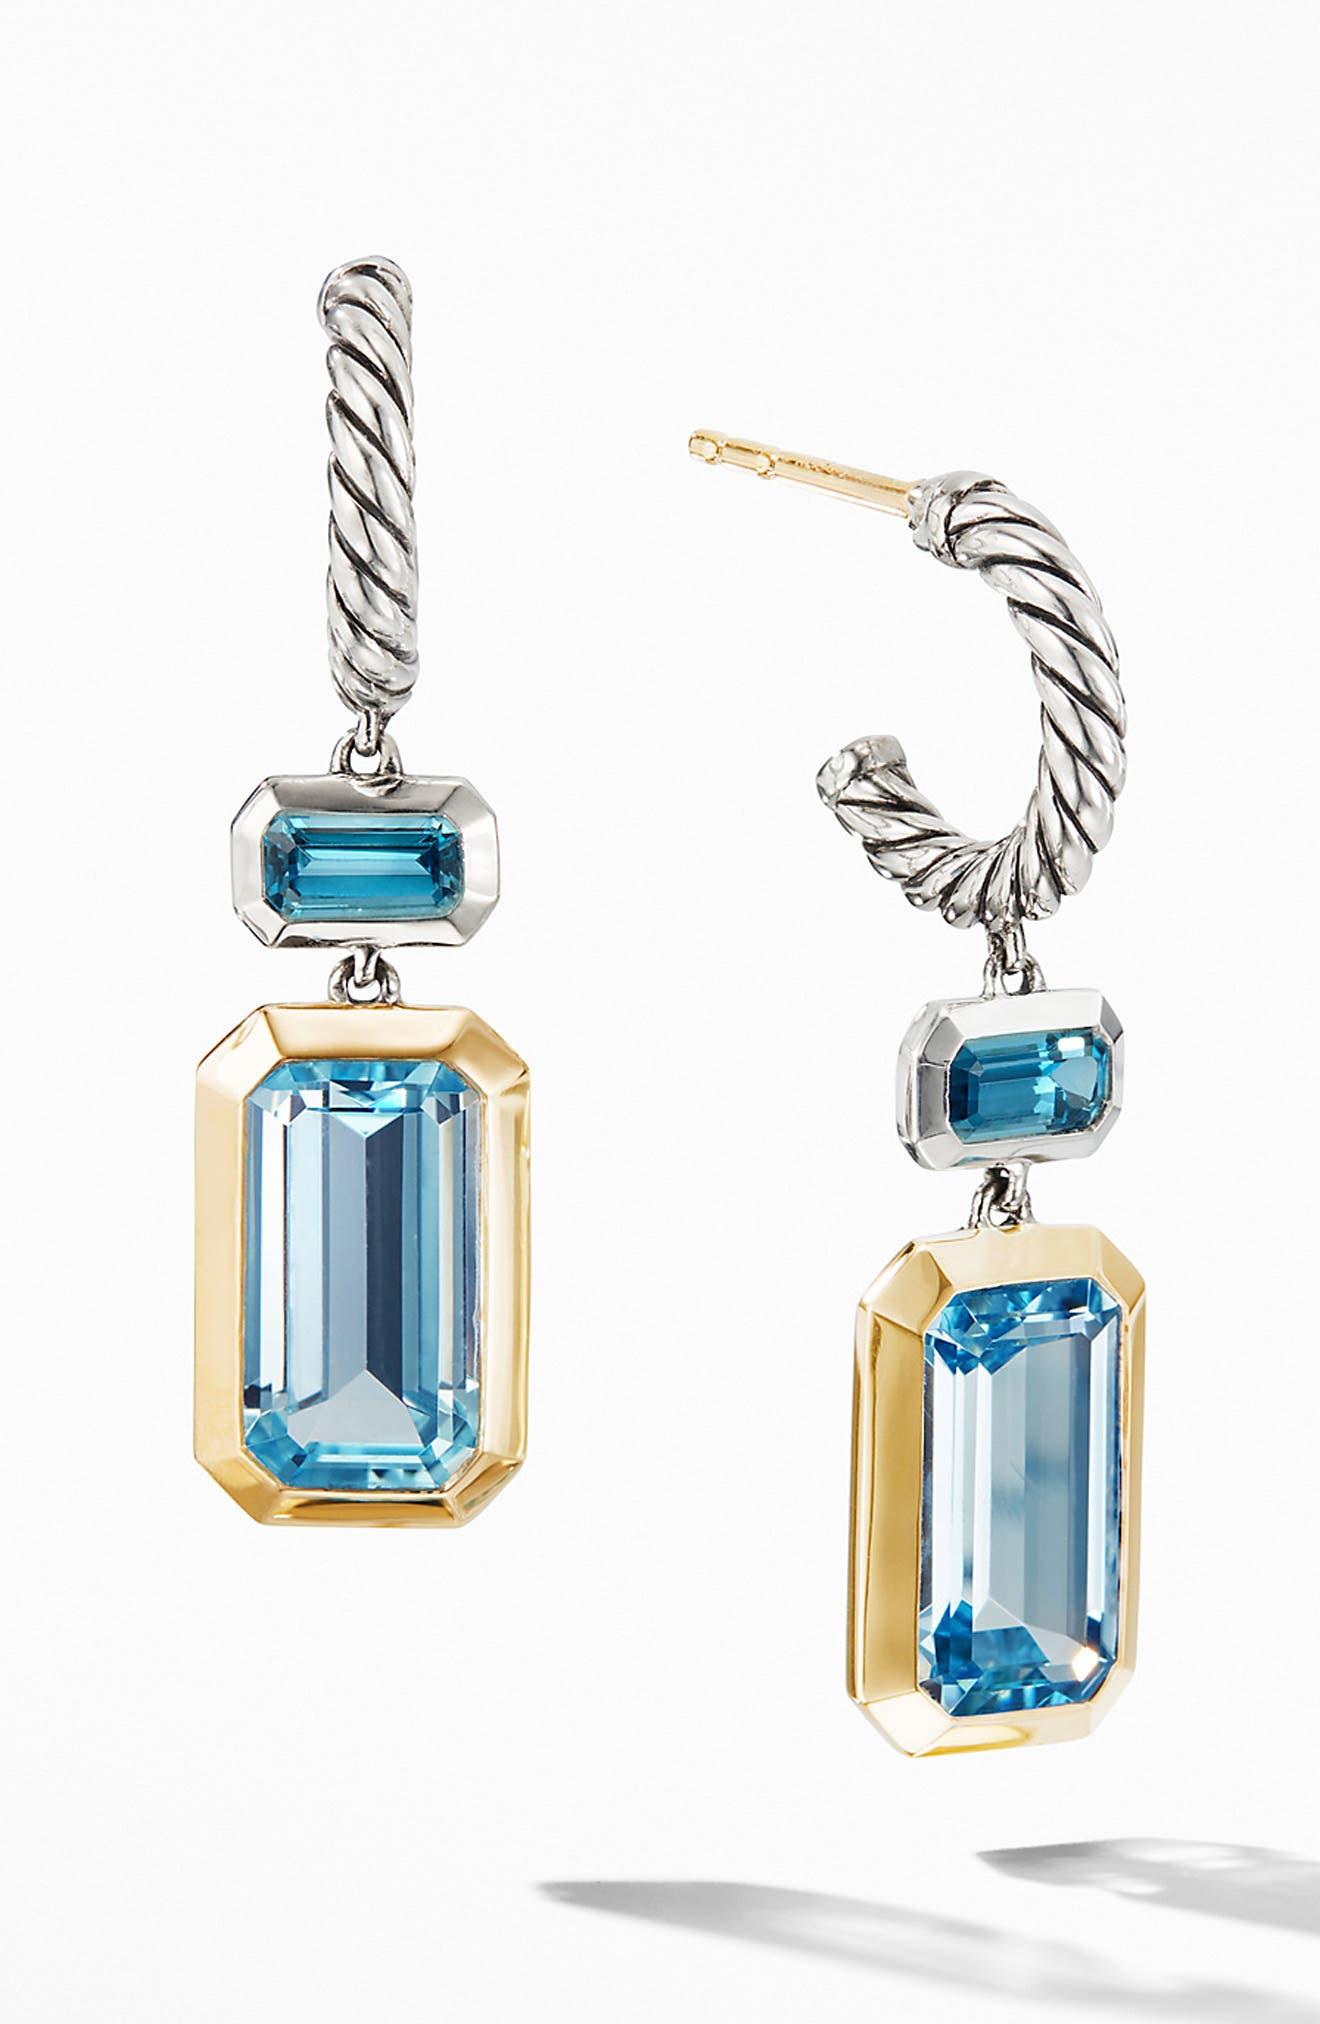 DAVID YURMAN Novella Drop Earrings with 18K Yellow Gold, Main, color, SKY BLUE TOPAZ